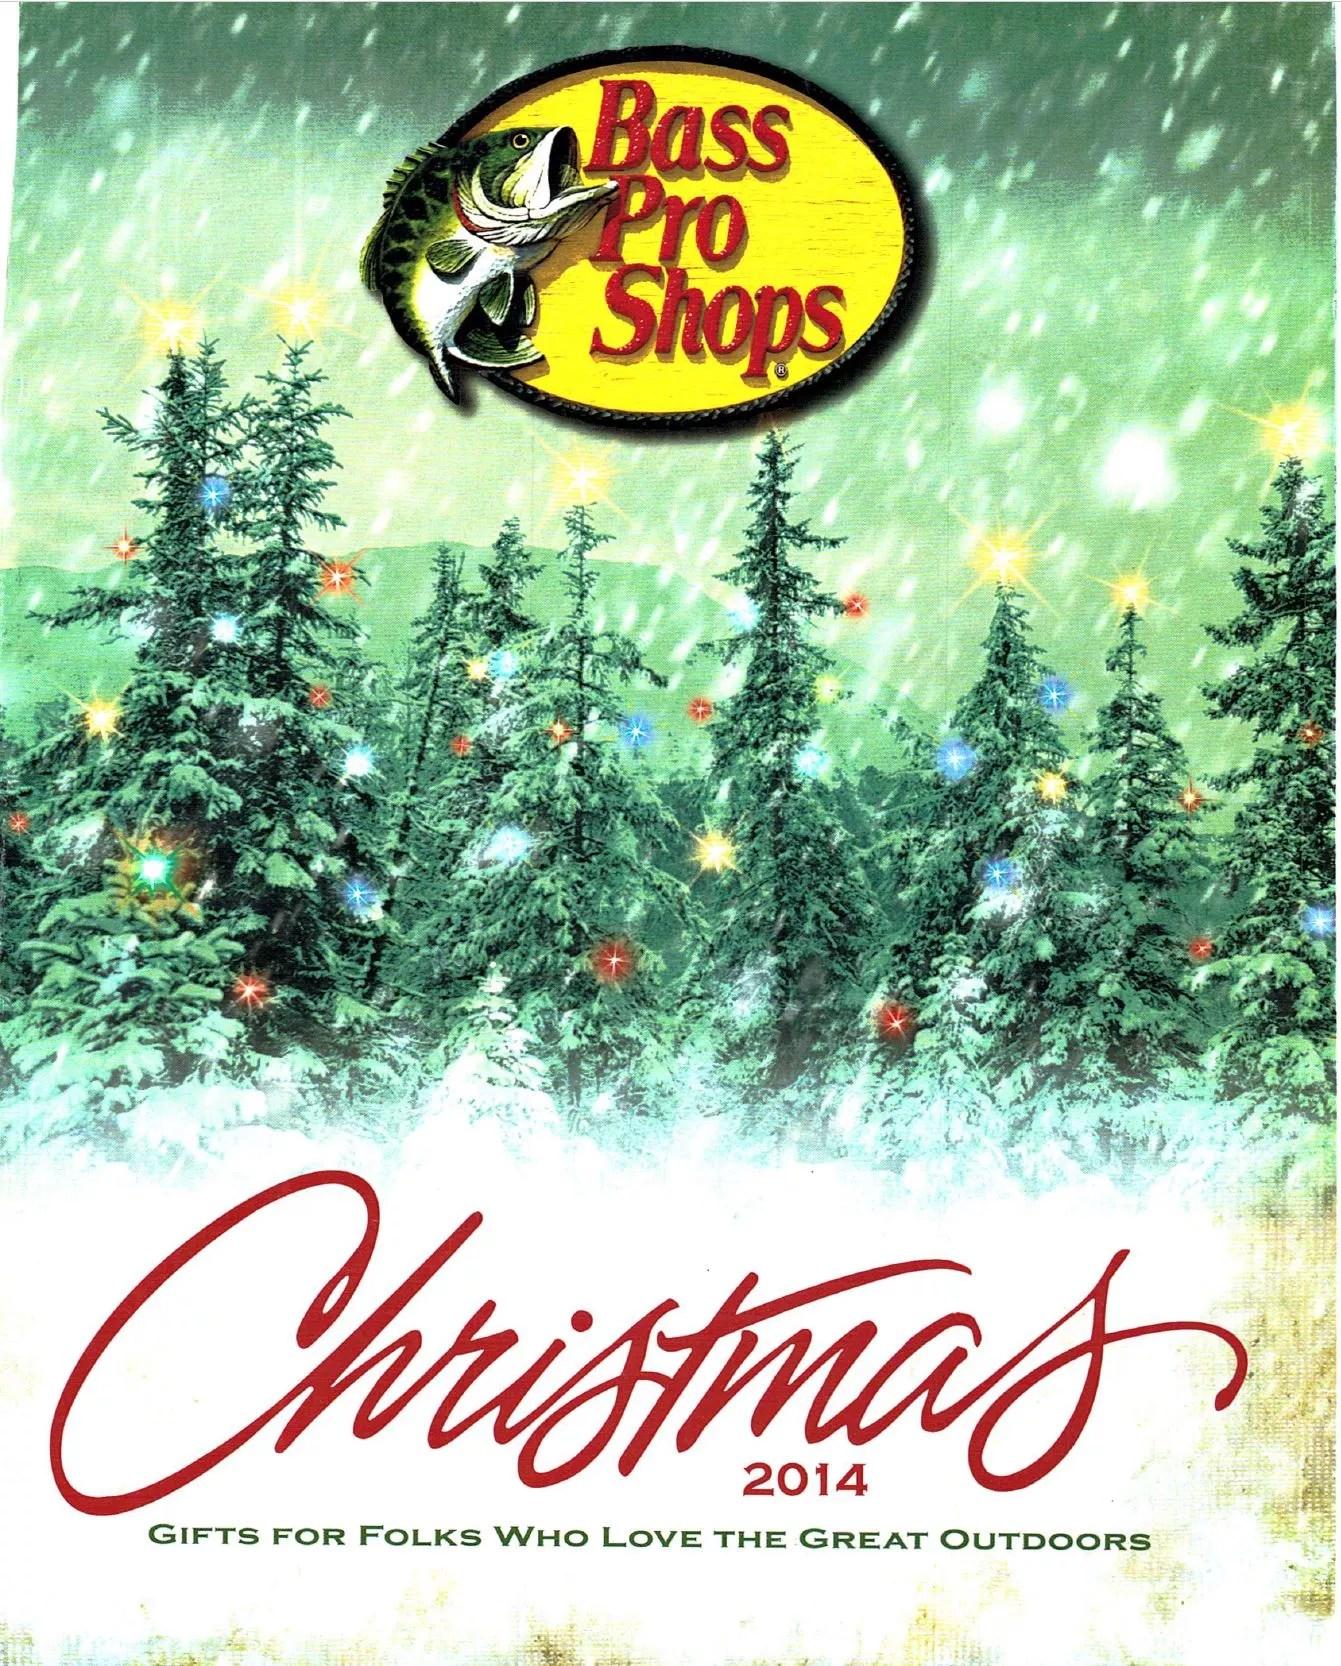 Bass Pro Shop Christmas Catalog 2014 – ORCA